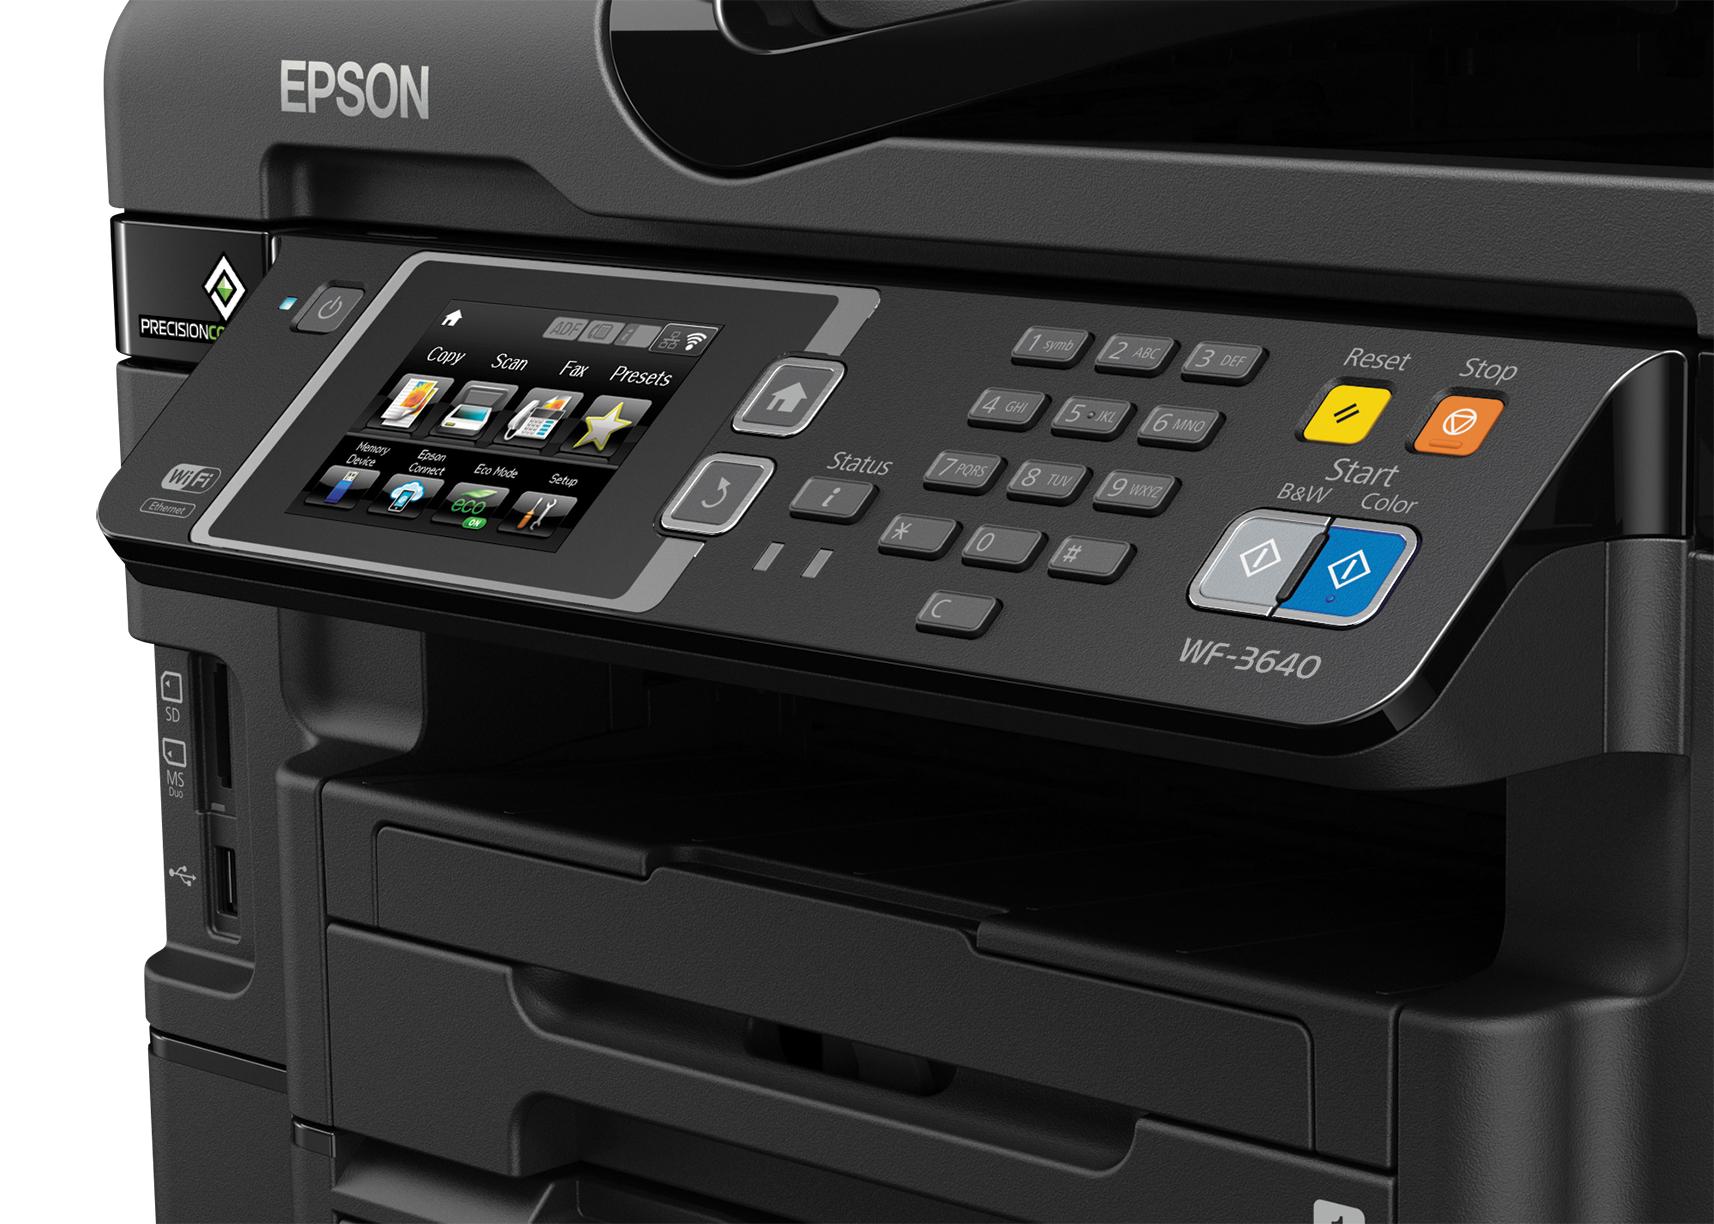 Epson-C11CD16201-WorkForce-WF-3640-All-in-One-Printer-Copier-Scanner-Fax-Machine thumbnail 3